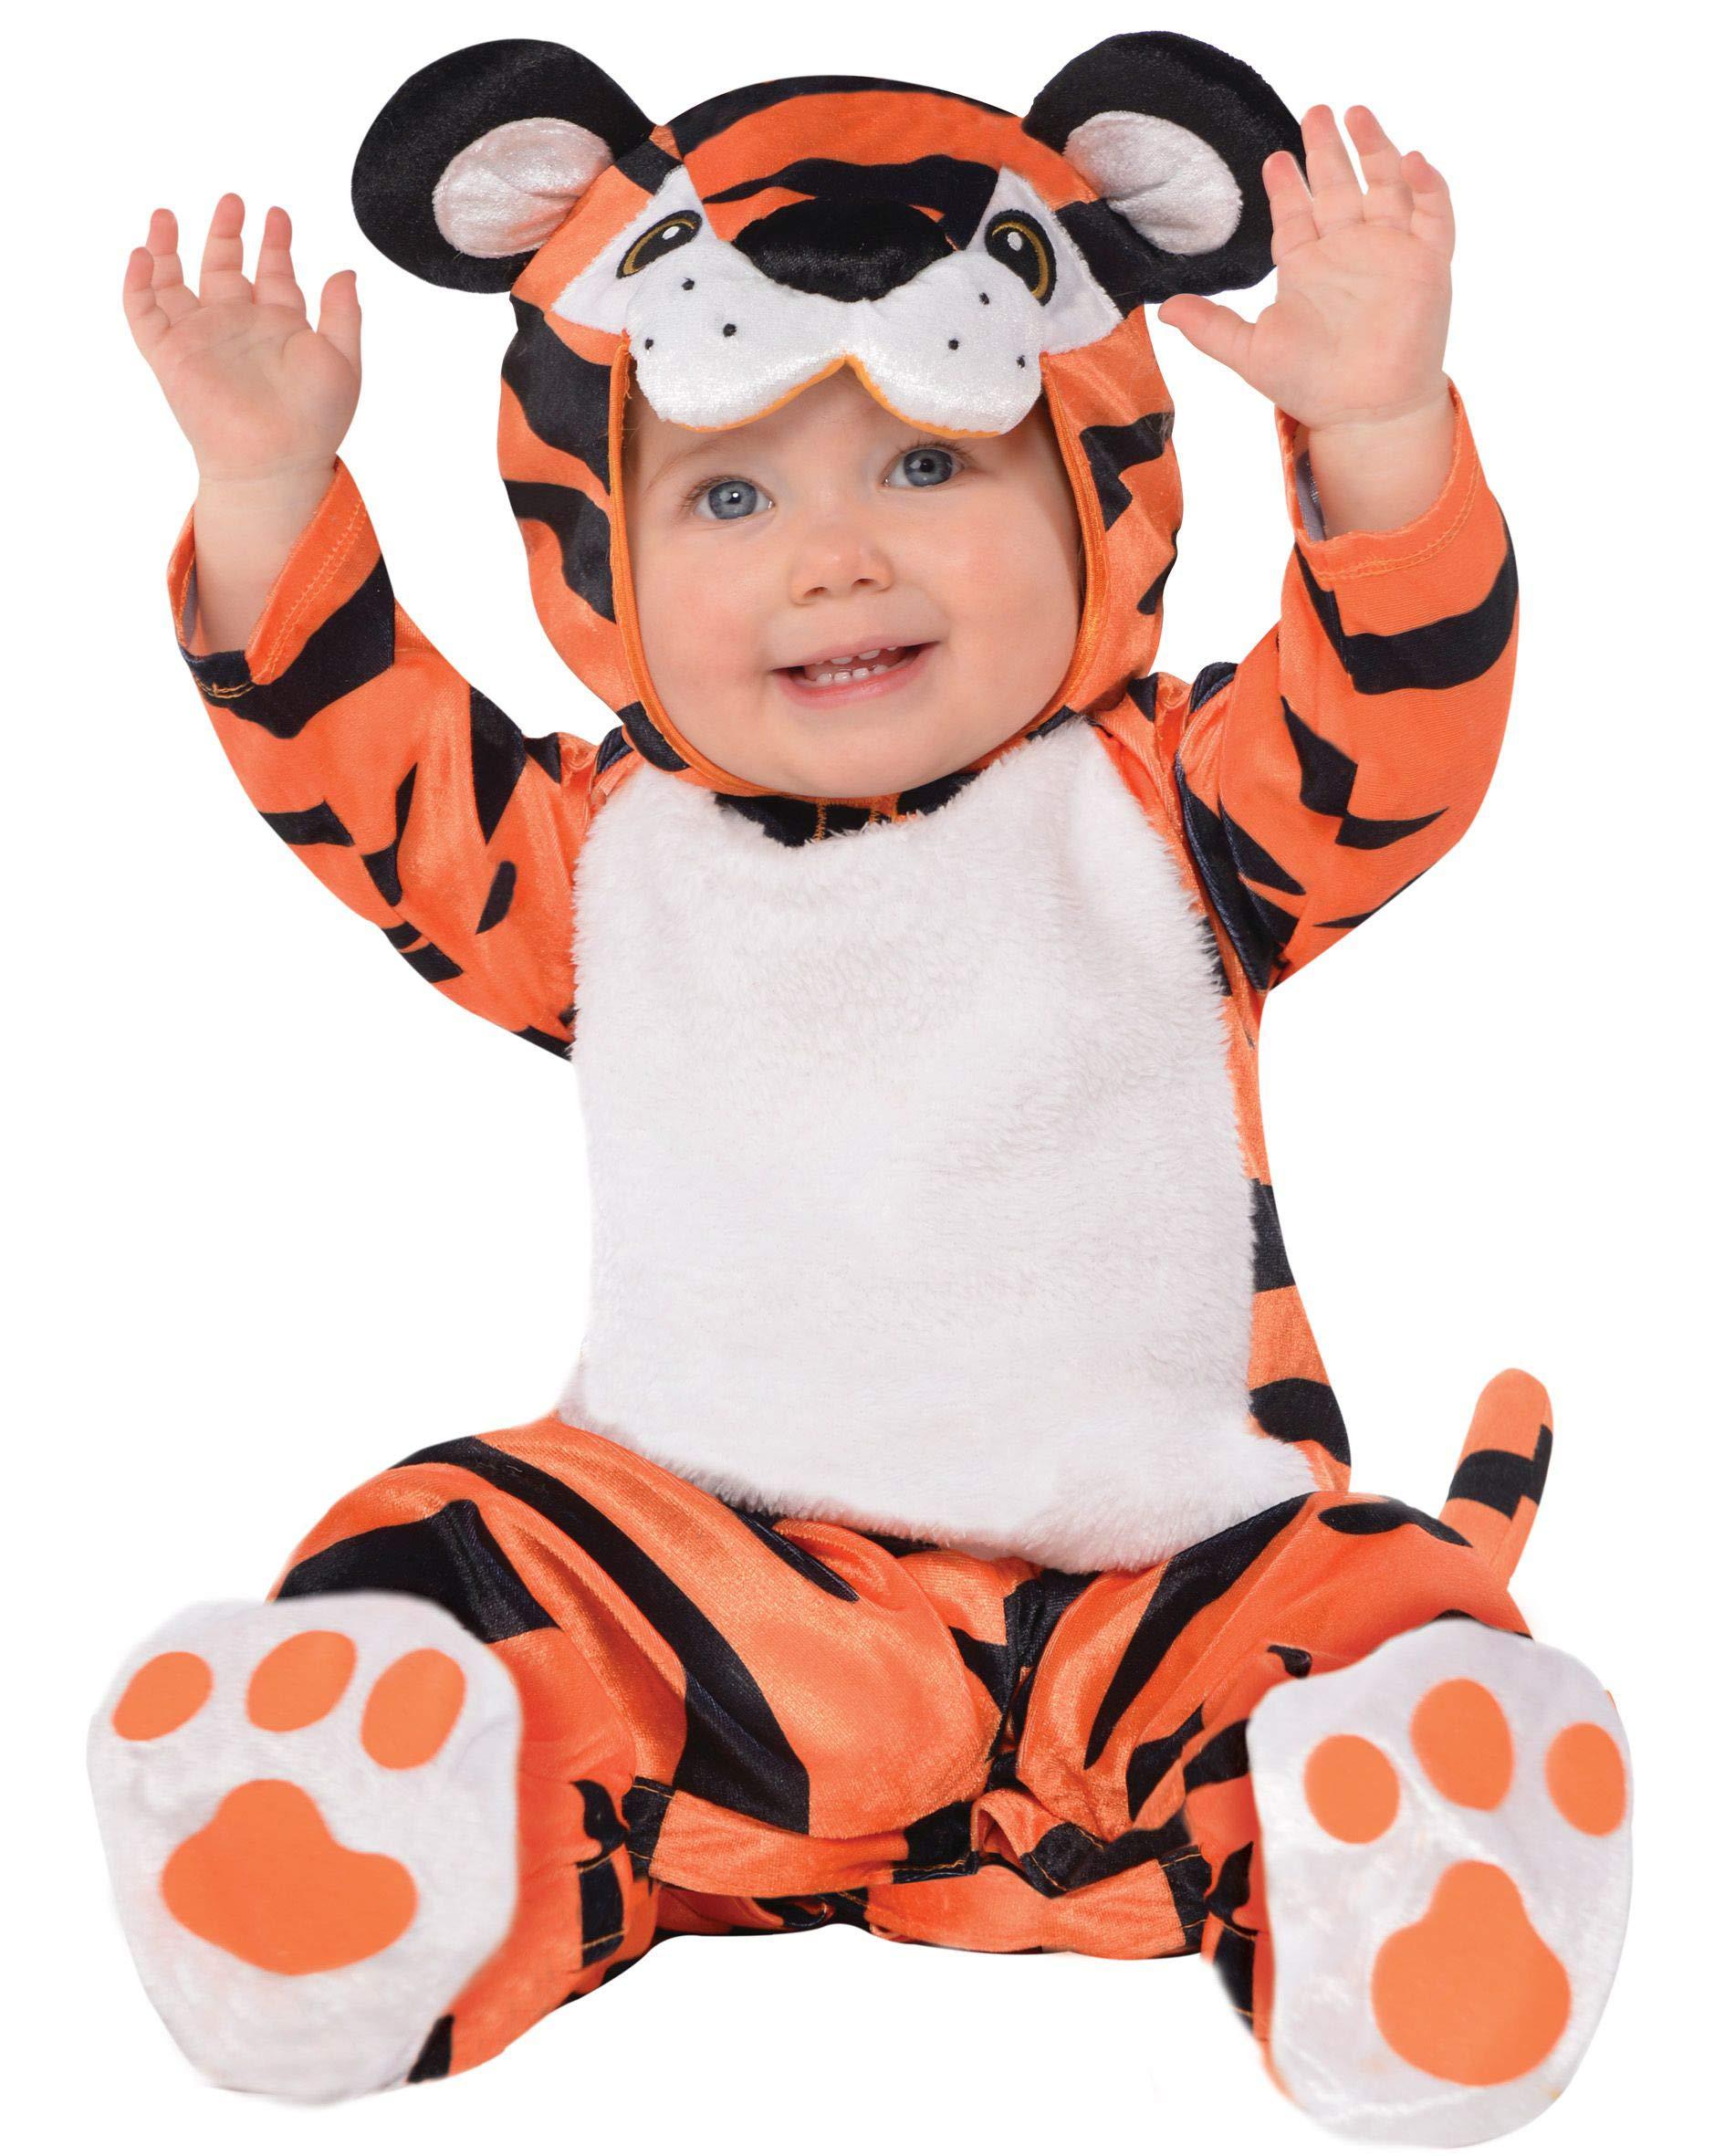 Childs Christys Dress Up pequeño tigre bebé niños disfraz